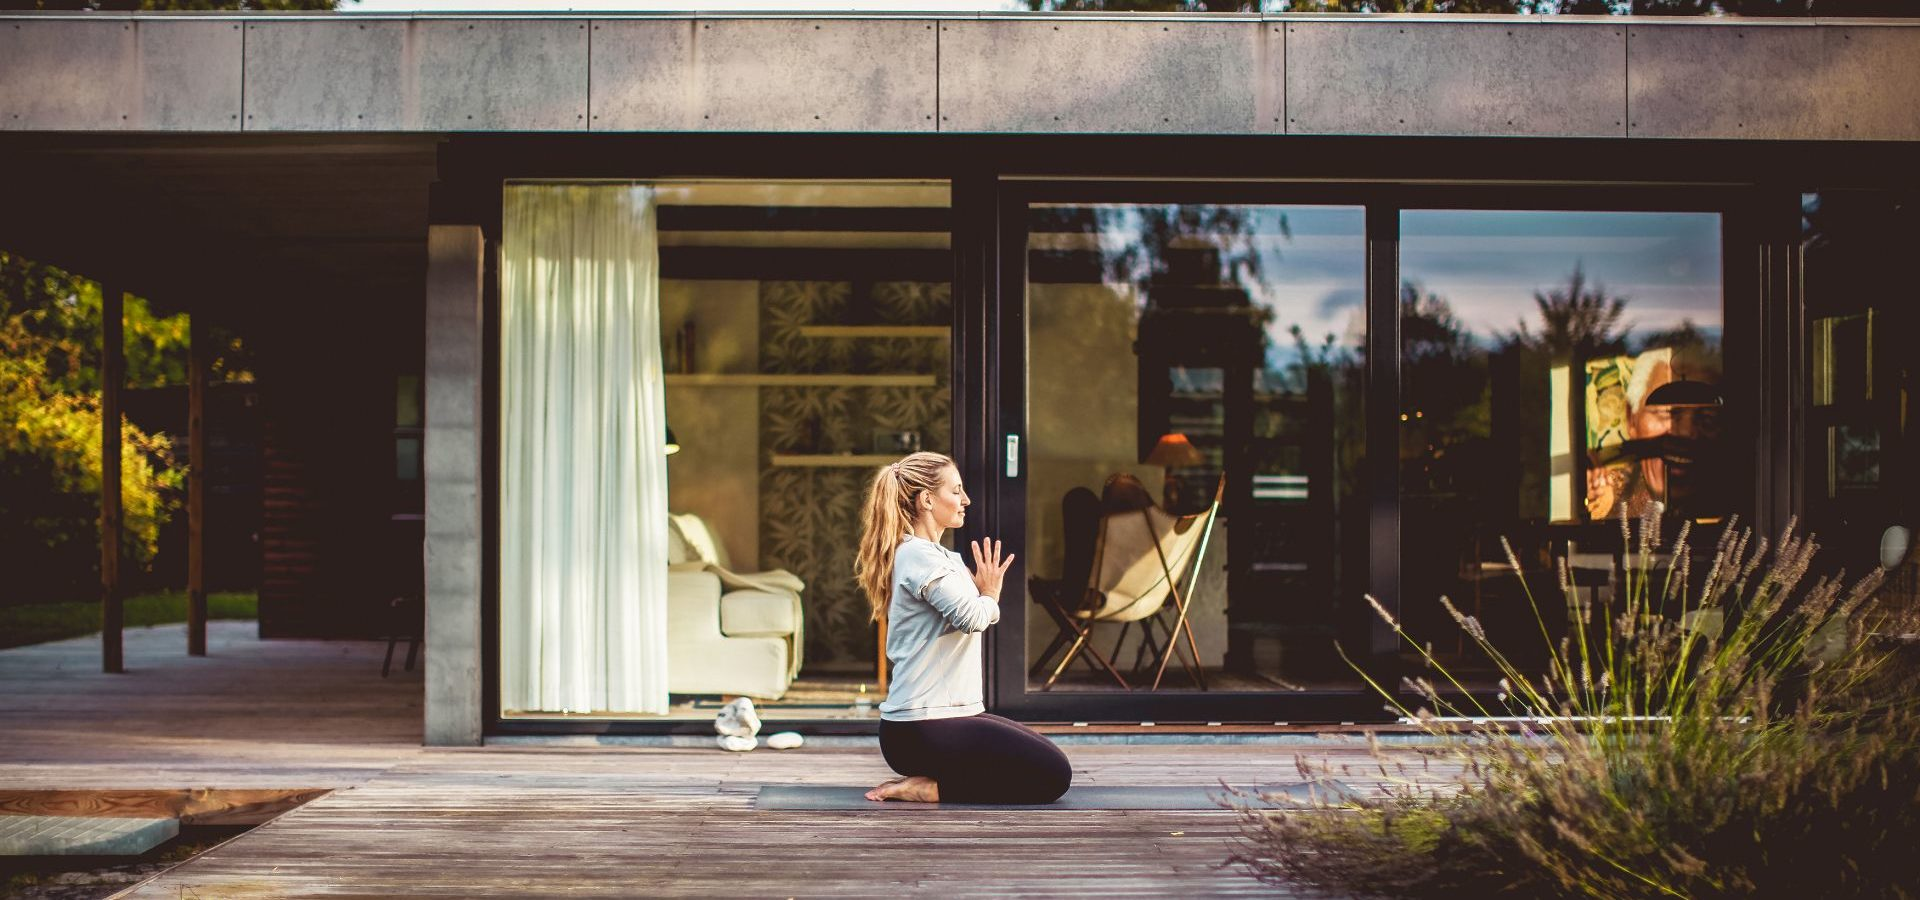 k-Freiseindesign Friederike Franze Yoga Basis Workshop Berlin-8569